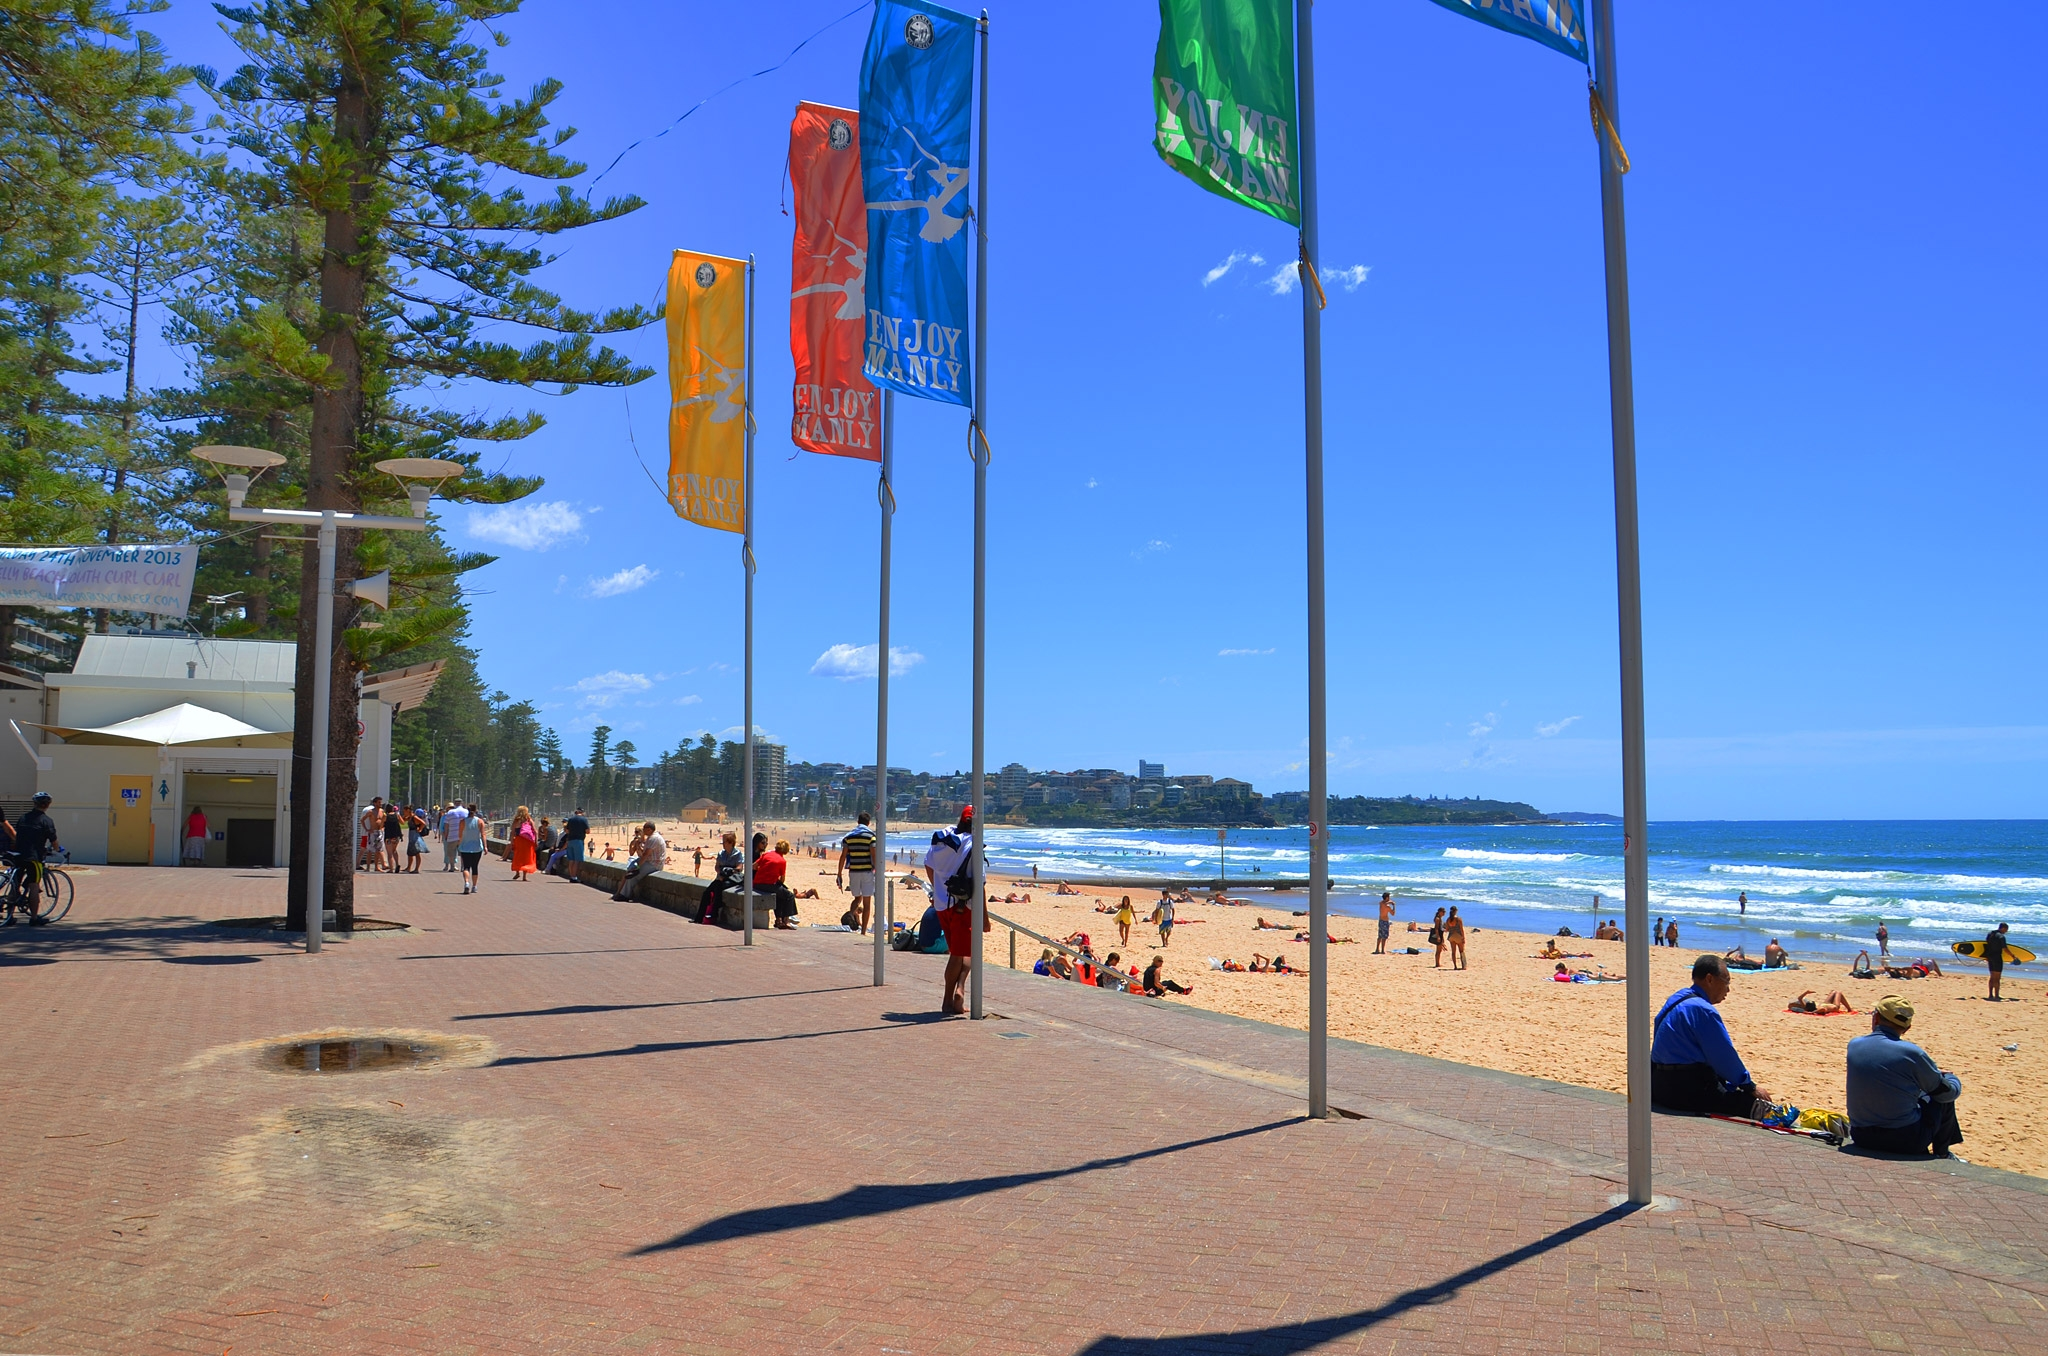 Manly Beach - Image ©2014 ManlyAustralia.com